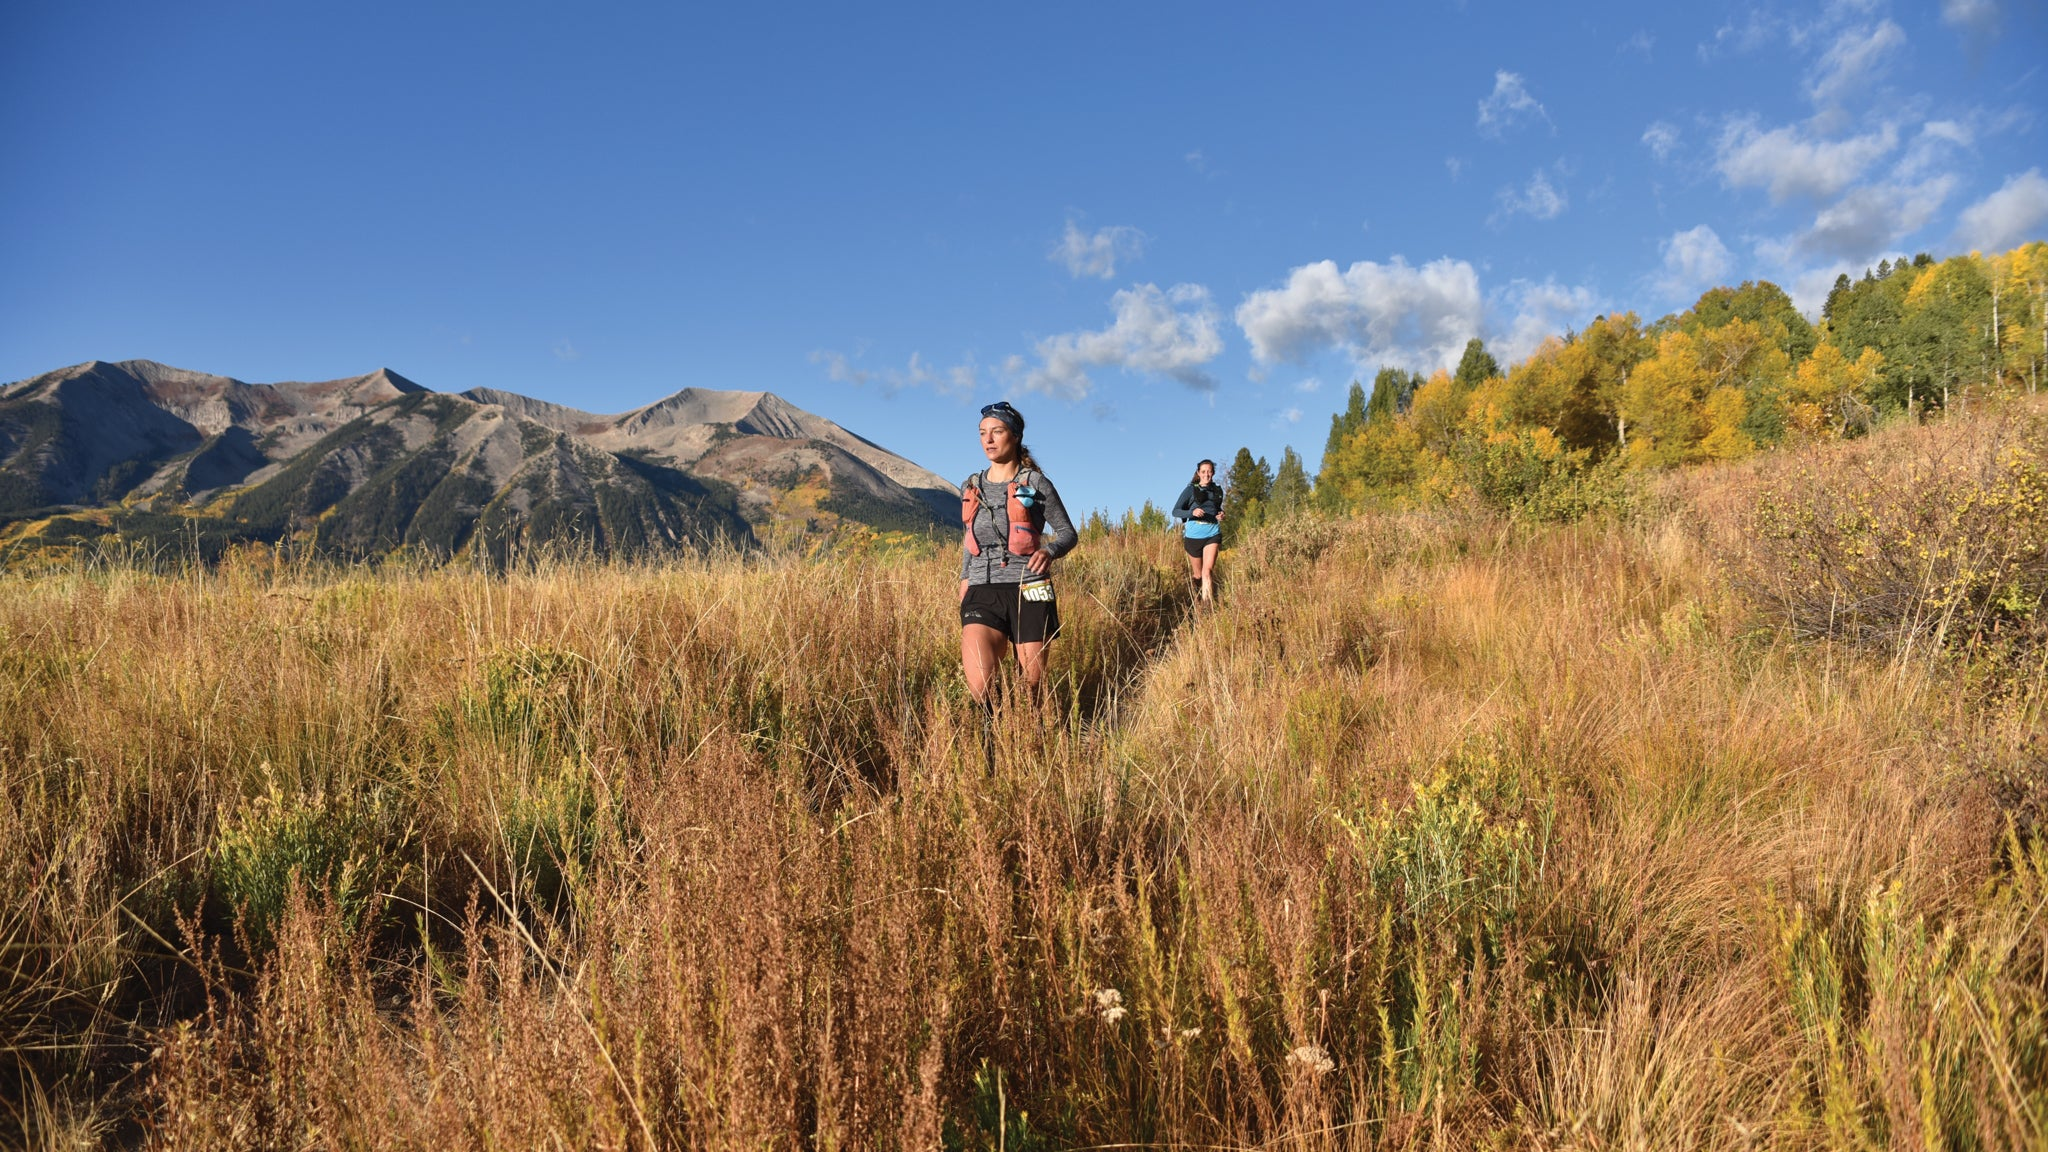 Women run through a mountain meadow during the Crested Butte Ultra